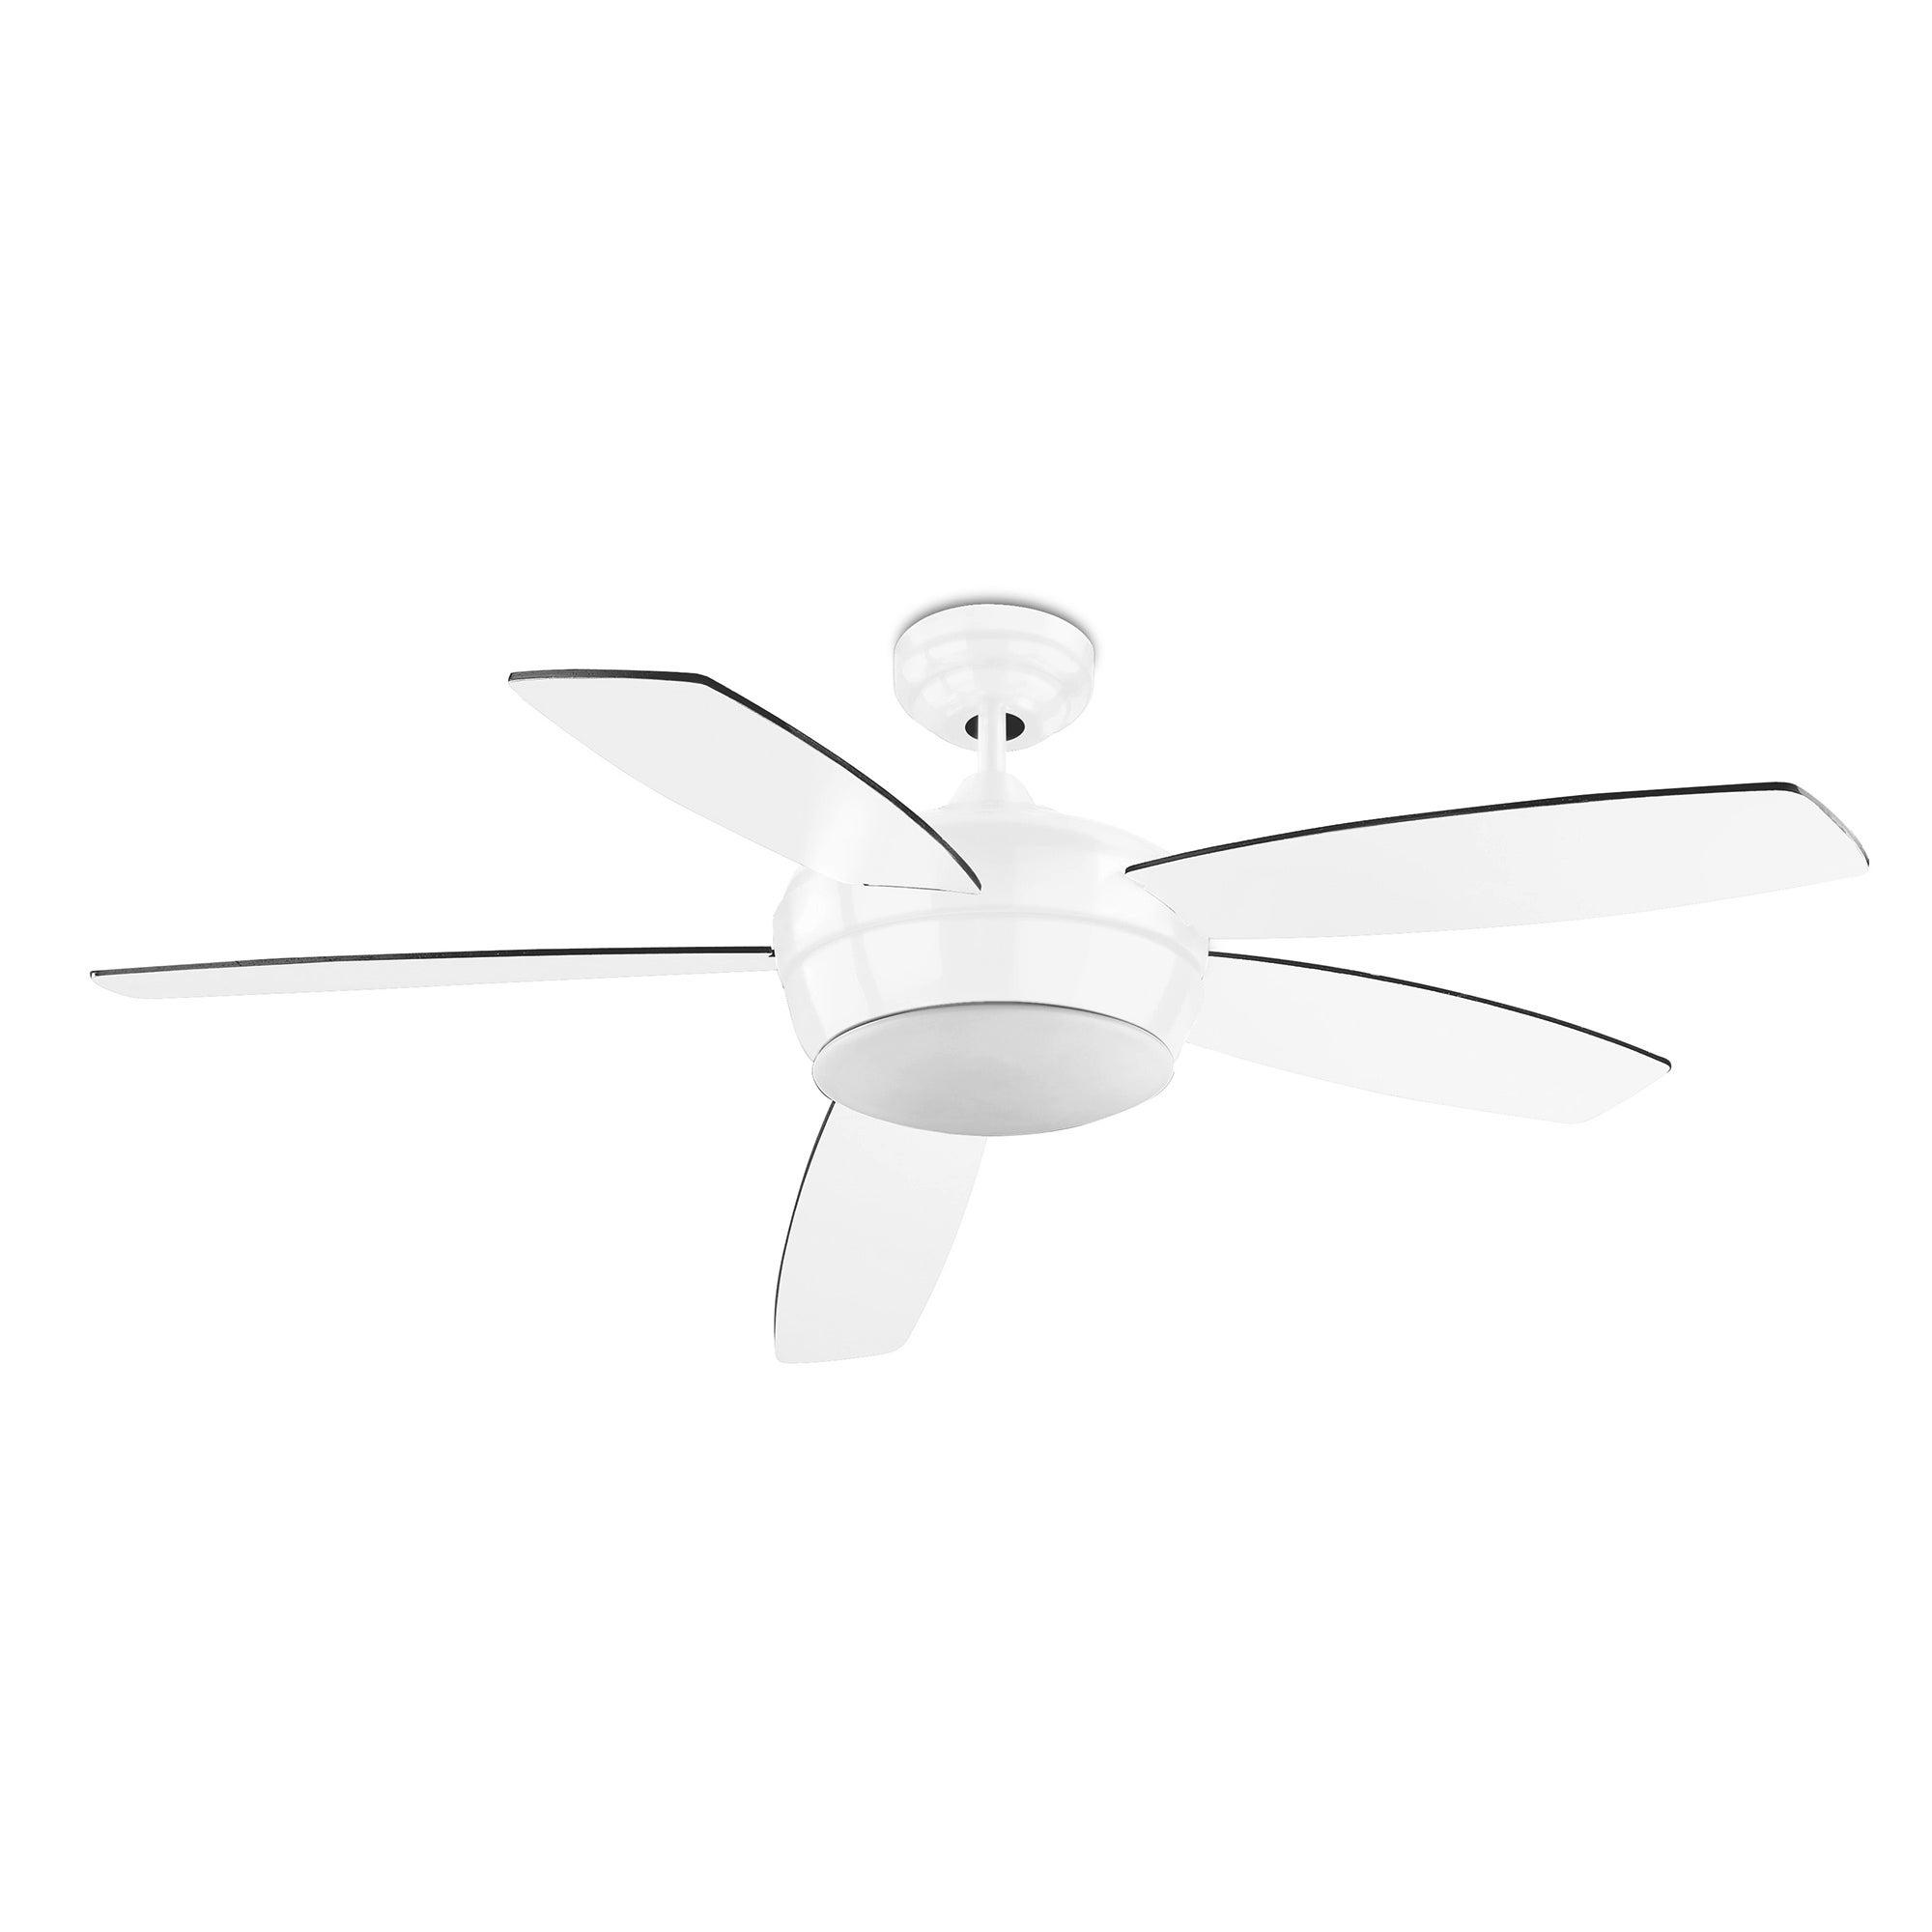 Ventilateur Plafond Blanc Leroy Merlin